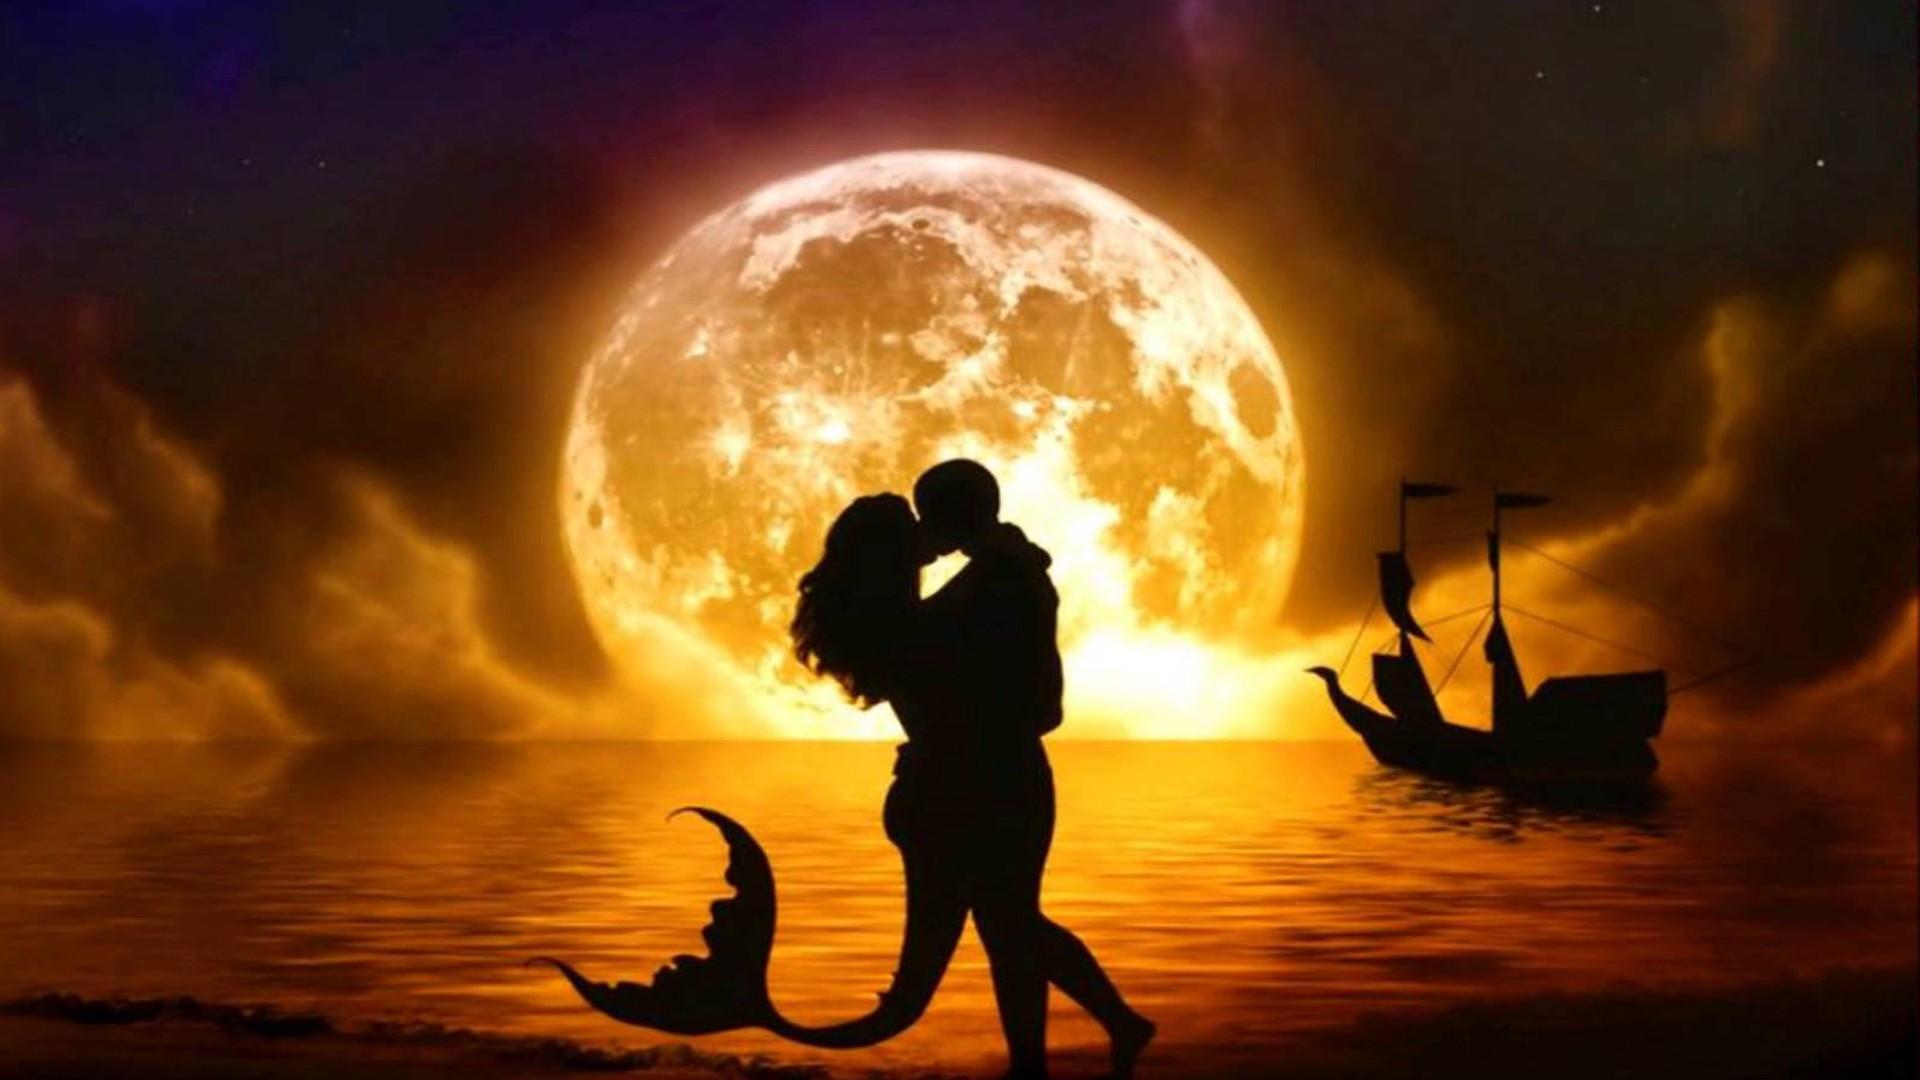 75 Lovers Kiss Wallpaper On Wallpapersafari